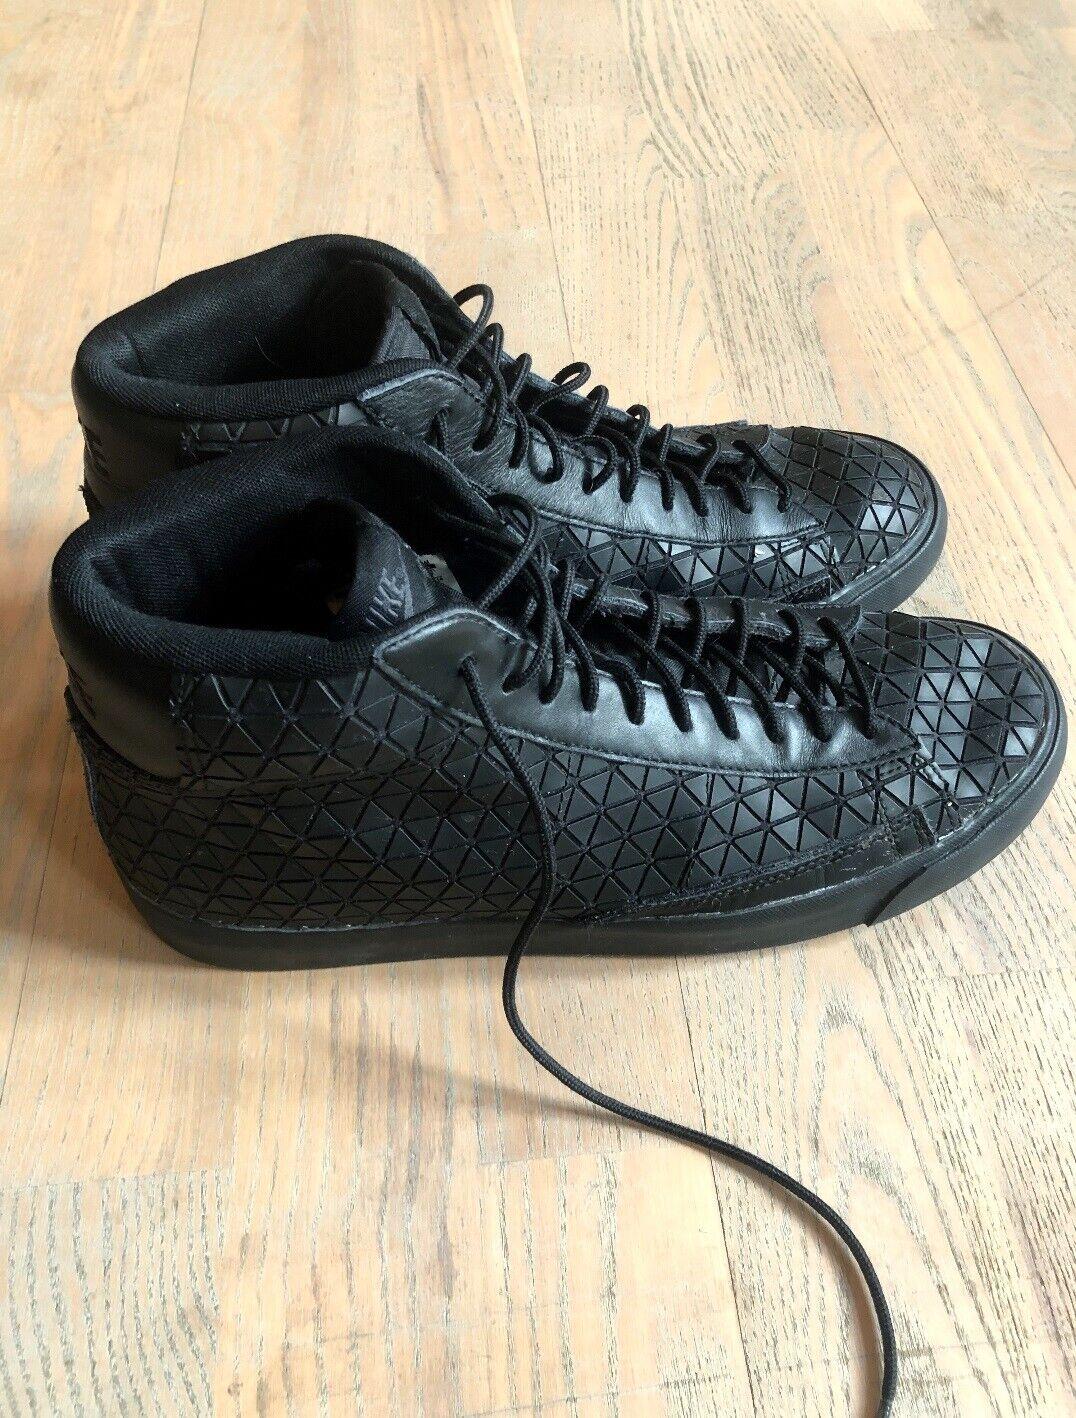 Sneakers, Nike Air Max 97 OG QS , str. 42